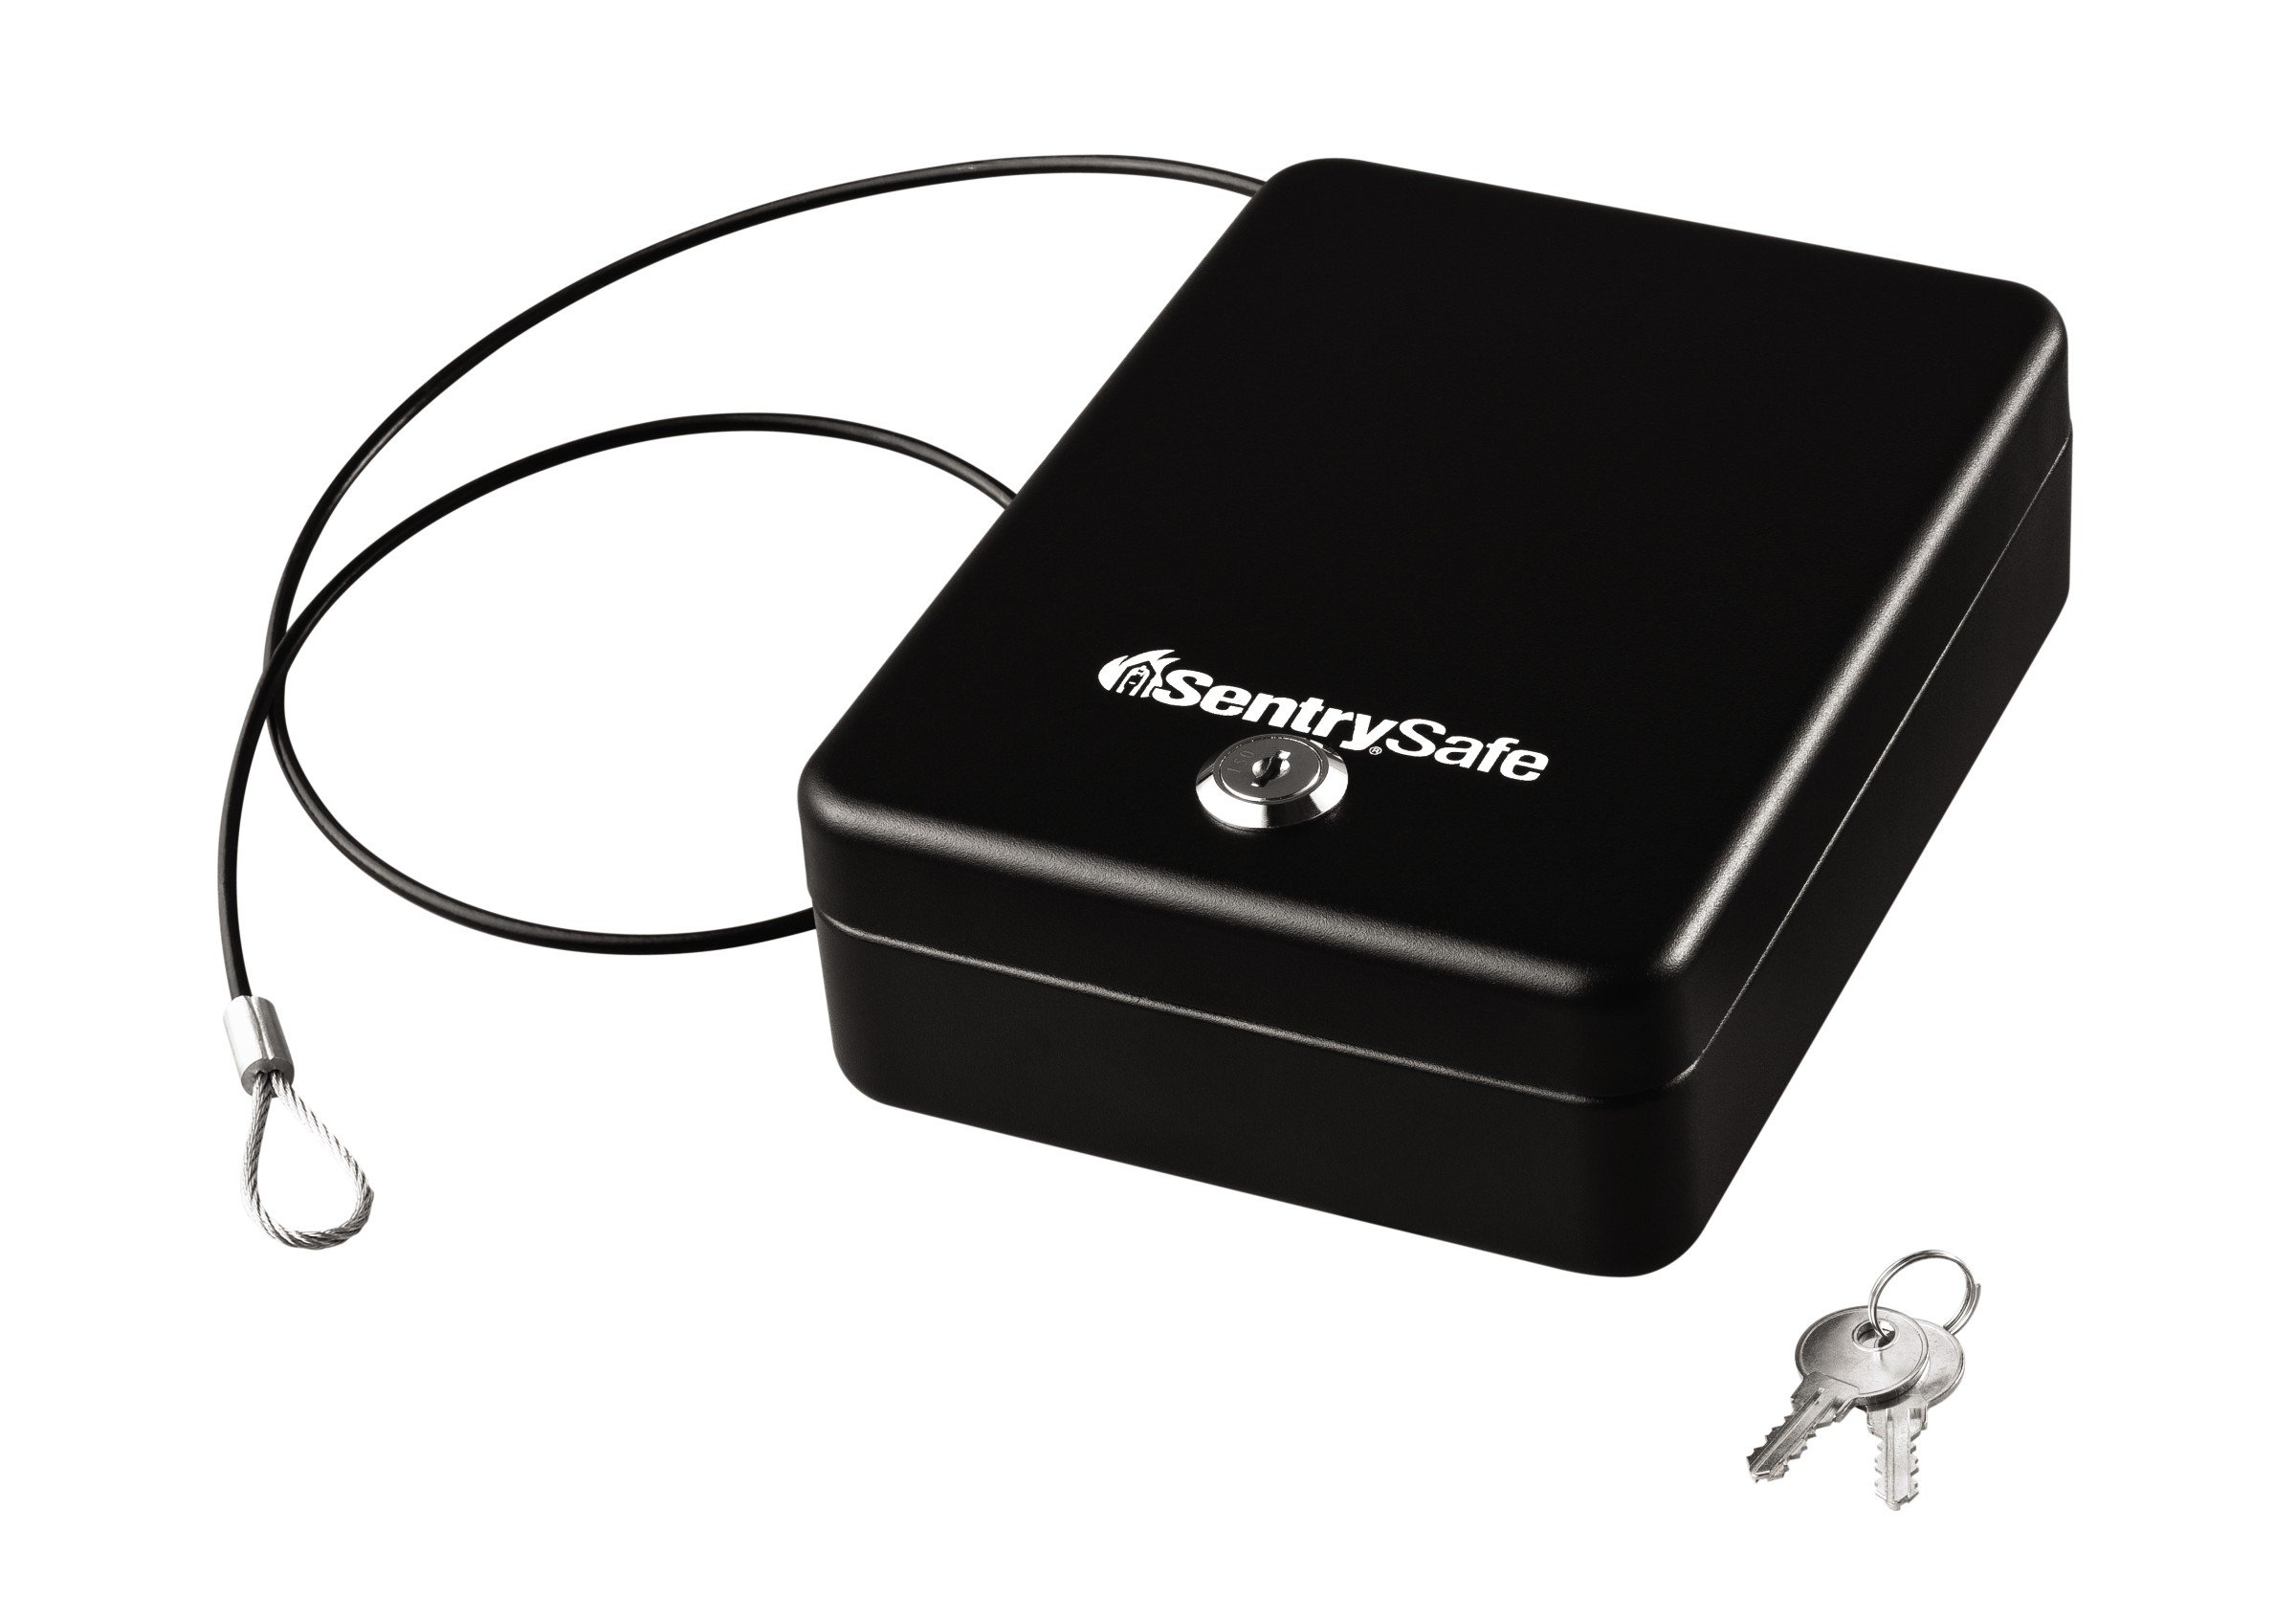 SentrySafe Compact Safe, Portable Security Safe with Key Lock, 0.05 Cubic Feet, P005K